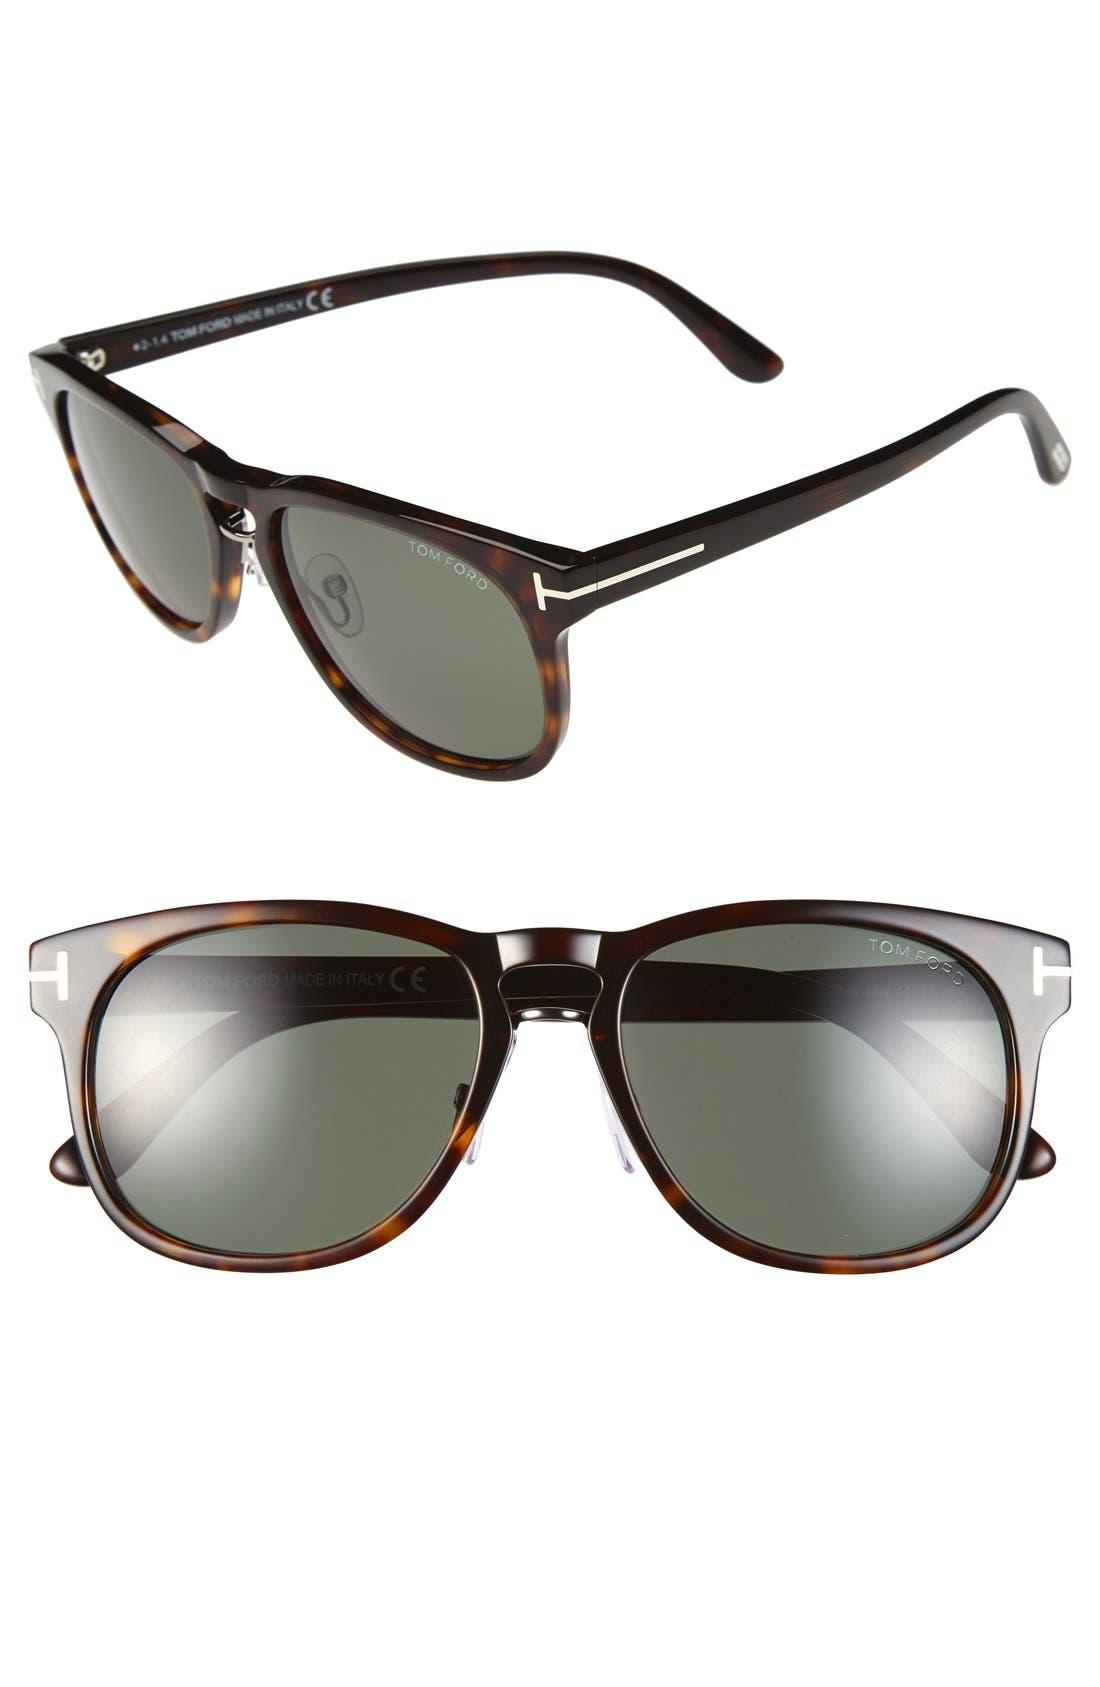 Alternate Image 1 Selected - Tom Ford 'Franklin' 55mm Sunglasses